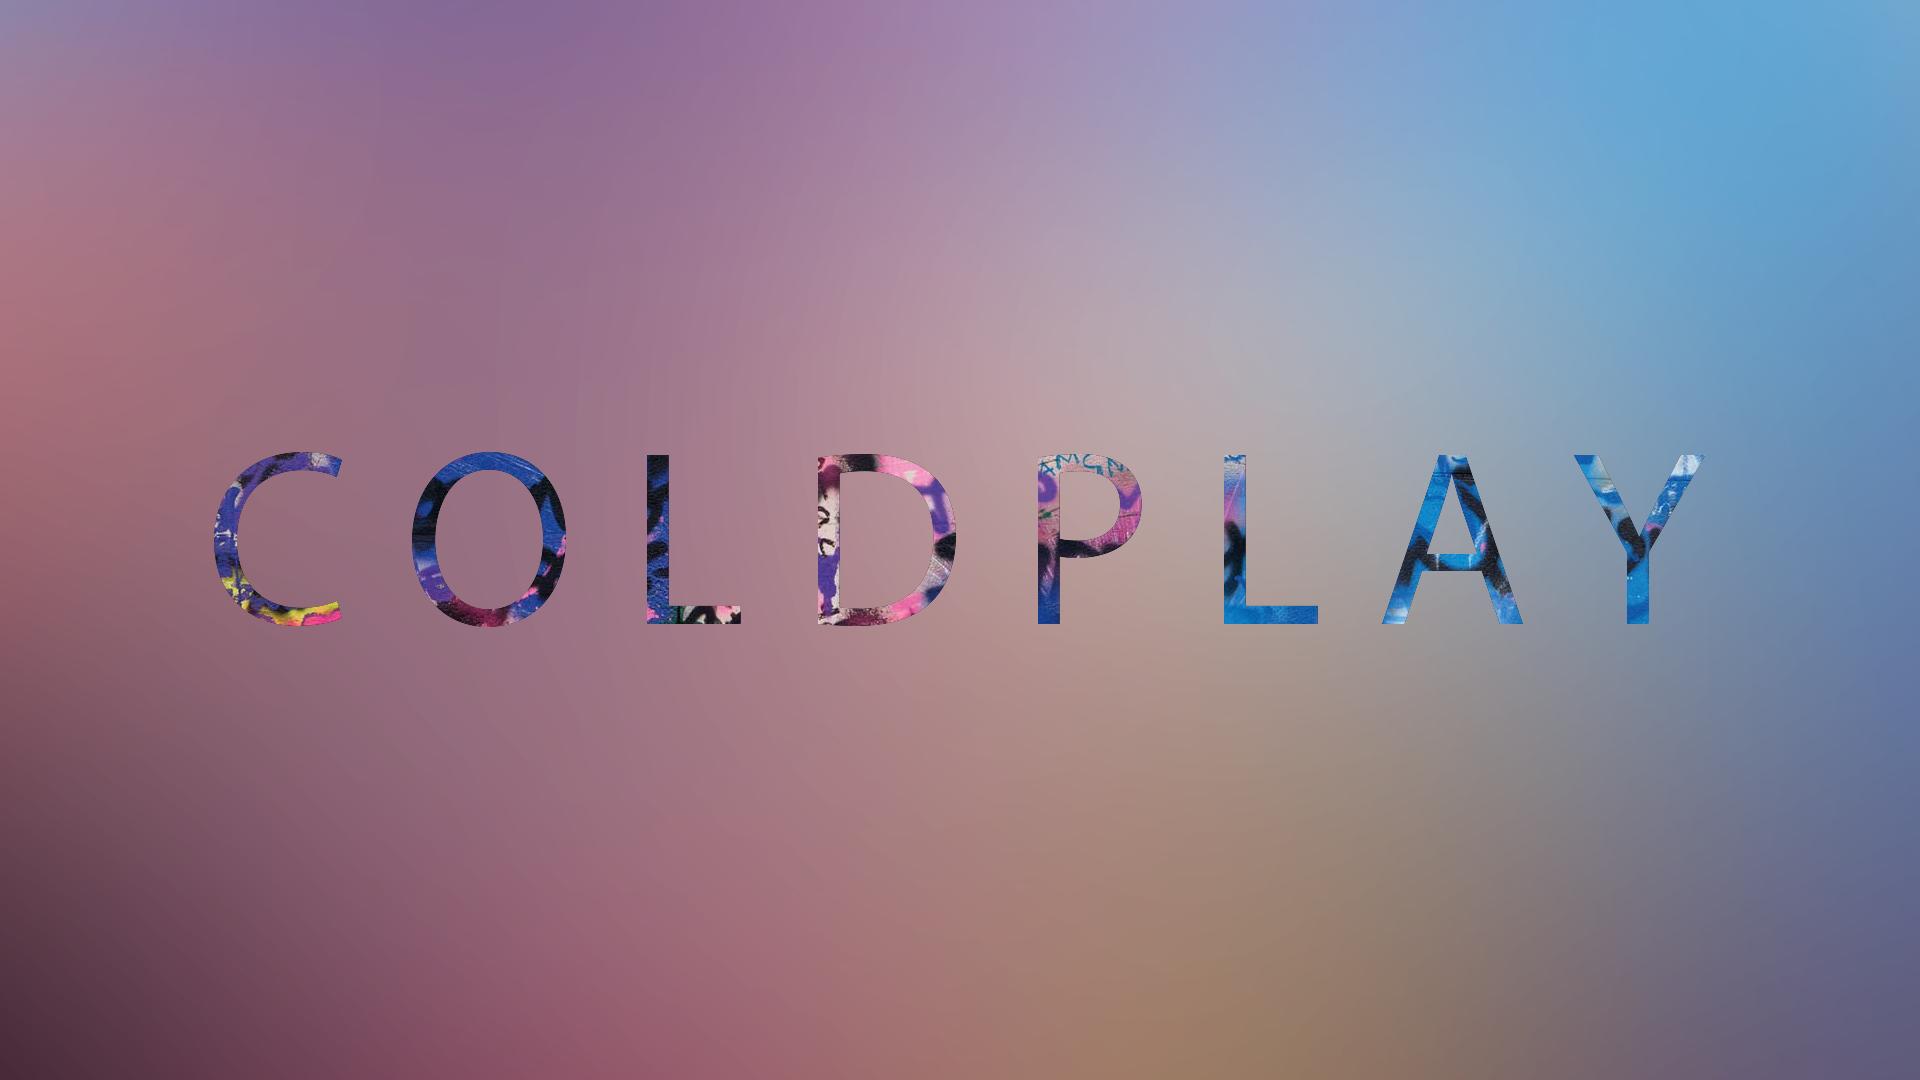 Coldplay-Viva-La-Vida-Parachutes-Rush-Blood-To-«-Tiled-wallpaper-wp3604164